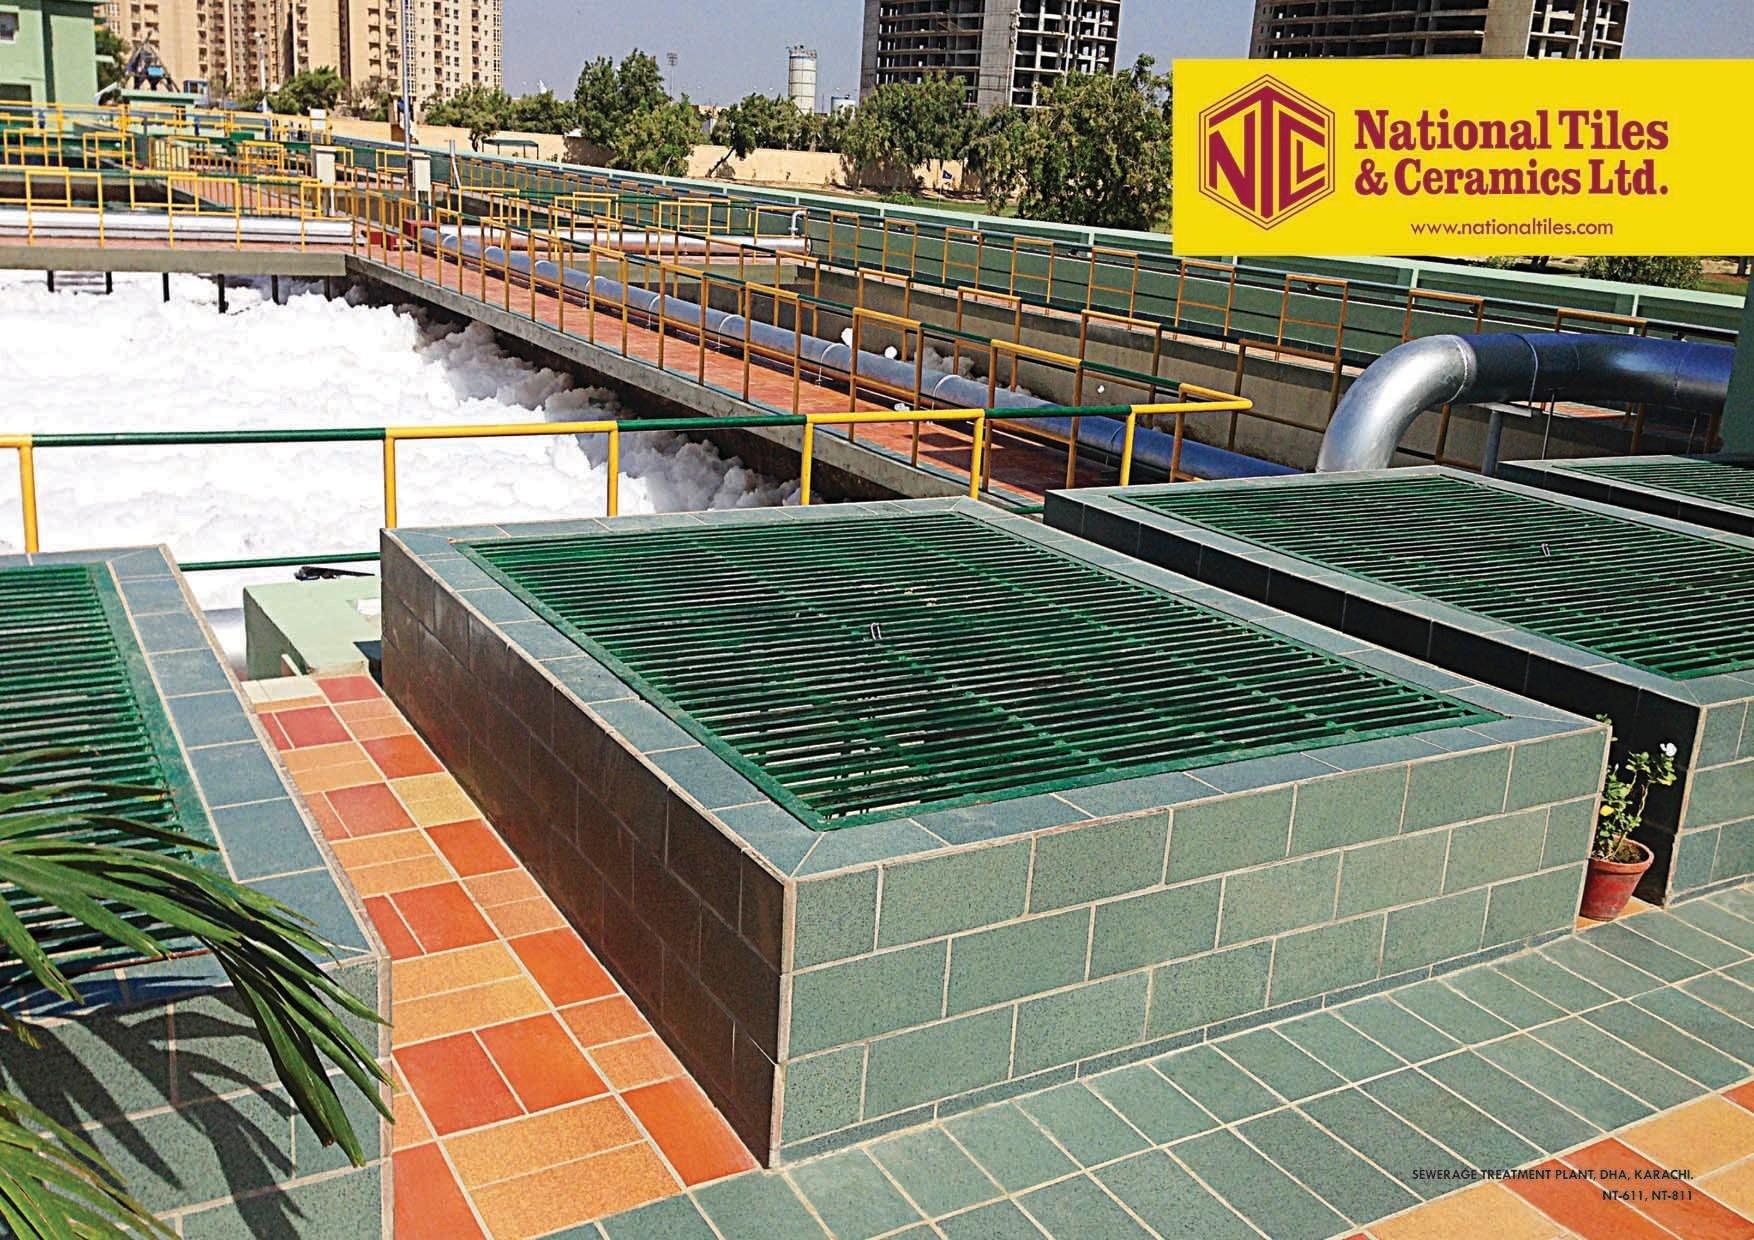 Sewerage Treatment Plant | National Tiles & Ceramics Ltd